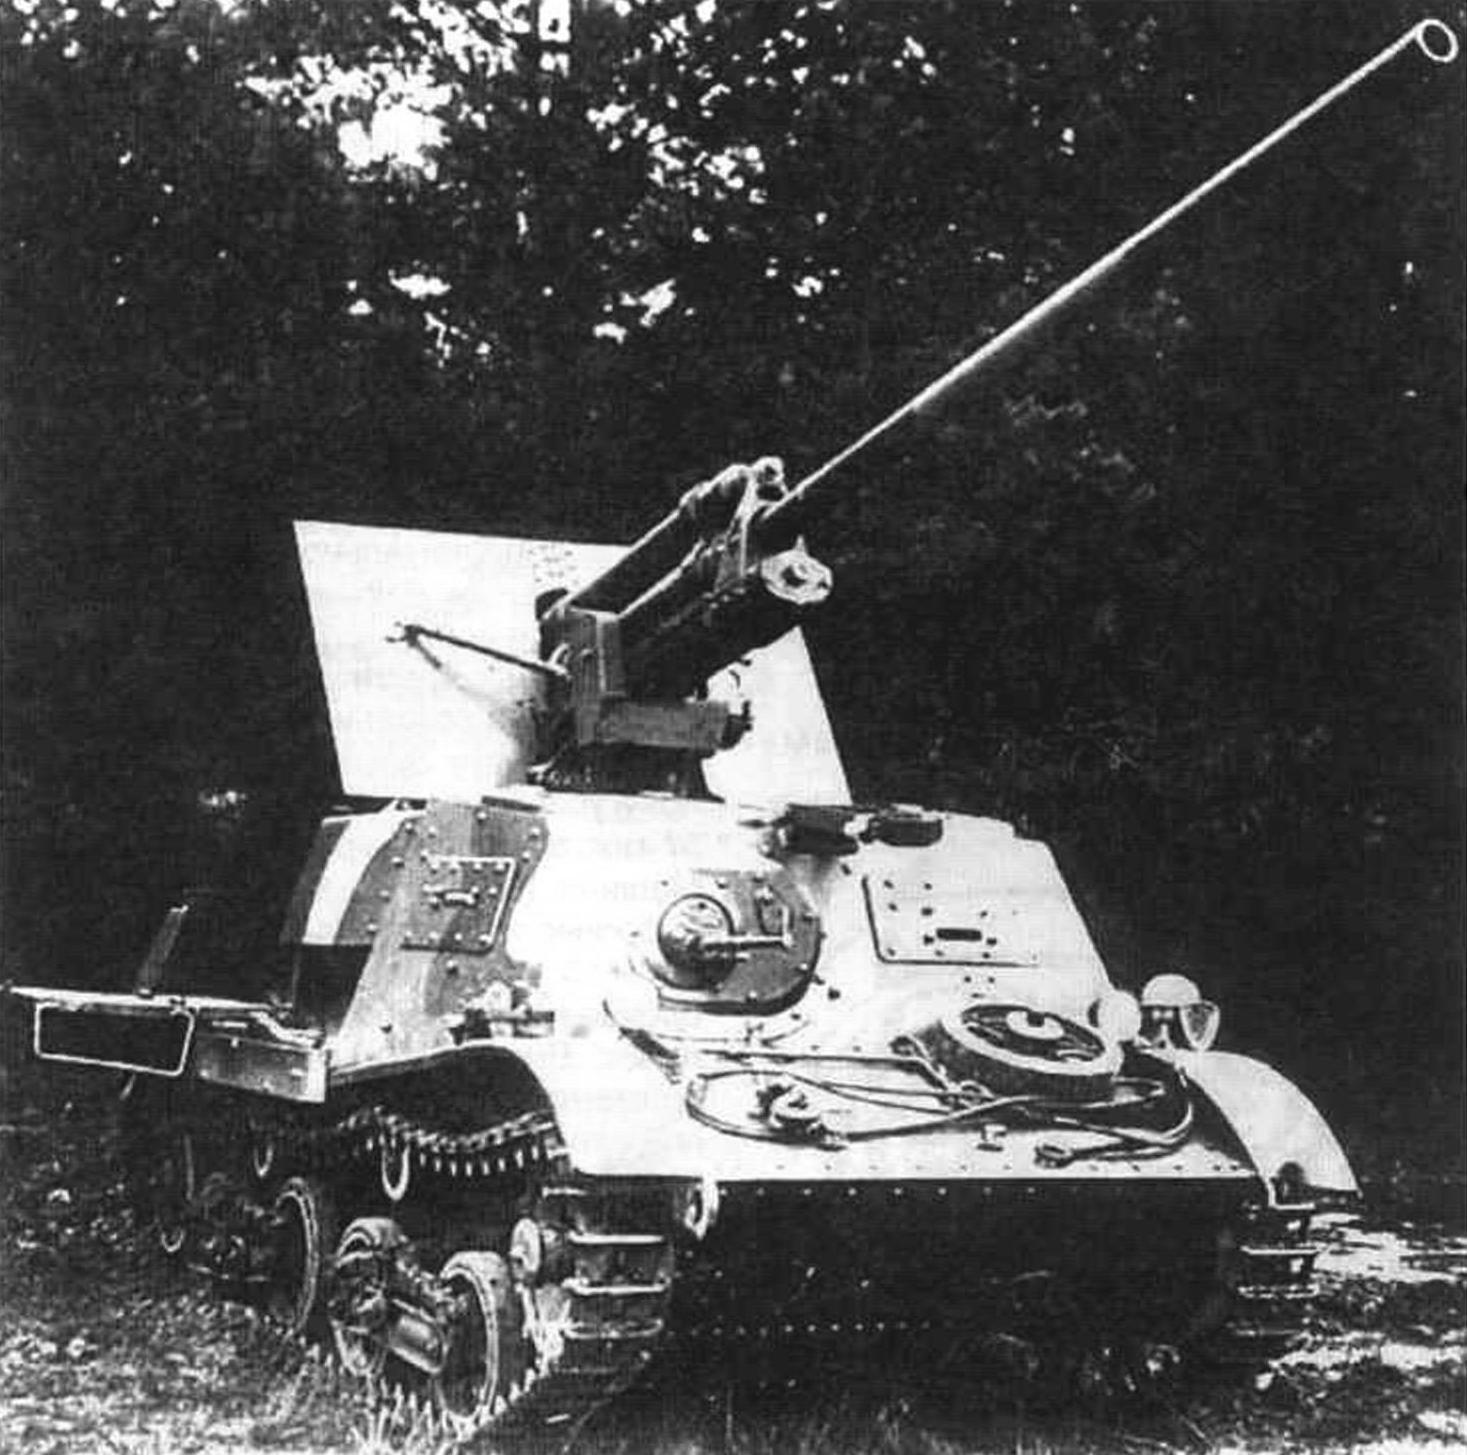 Гусеничная самоходная противотанковая установка ЗИС-30 на шасси тягача Т20 «Комсомолец» с 57-мм пушкой ЗИС-2. 1941 г.